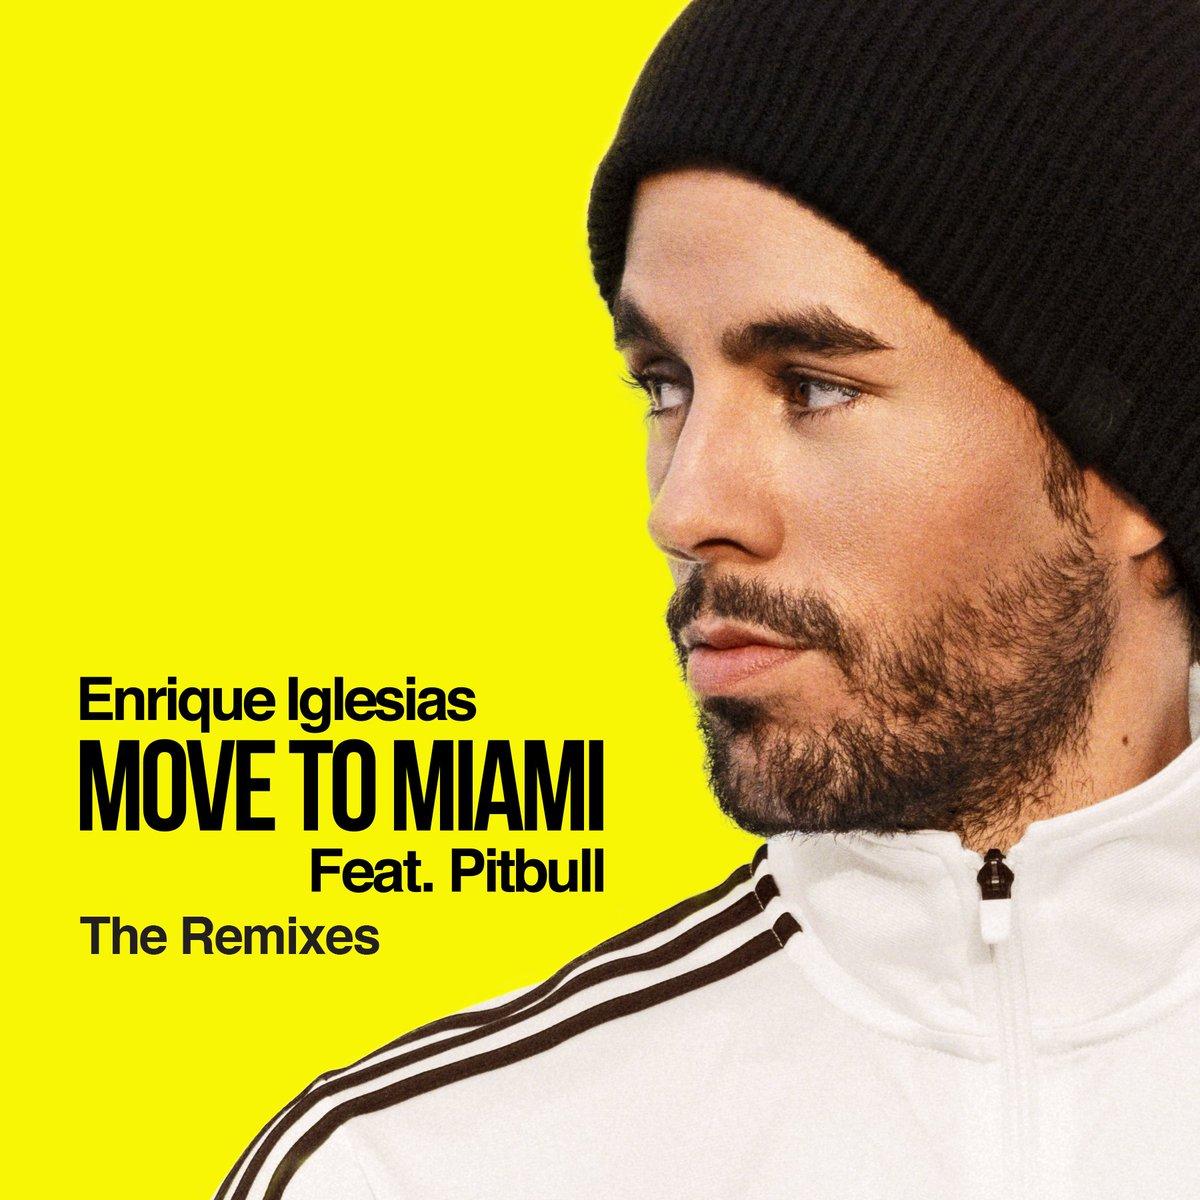 Have you heard the #MOVETOMIAMI remixes yet? Listen here: https://t.co/UmPiNvu8AJ https://t.co/jwNeEfCWxm